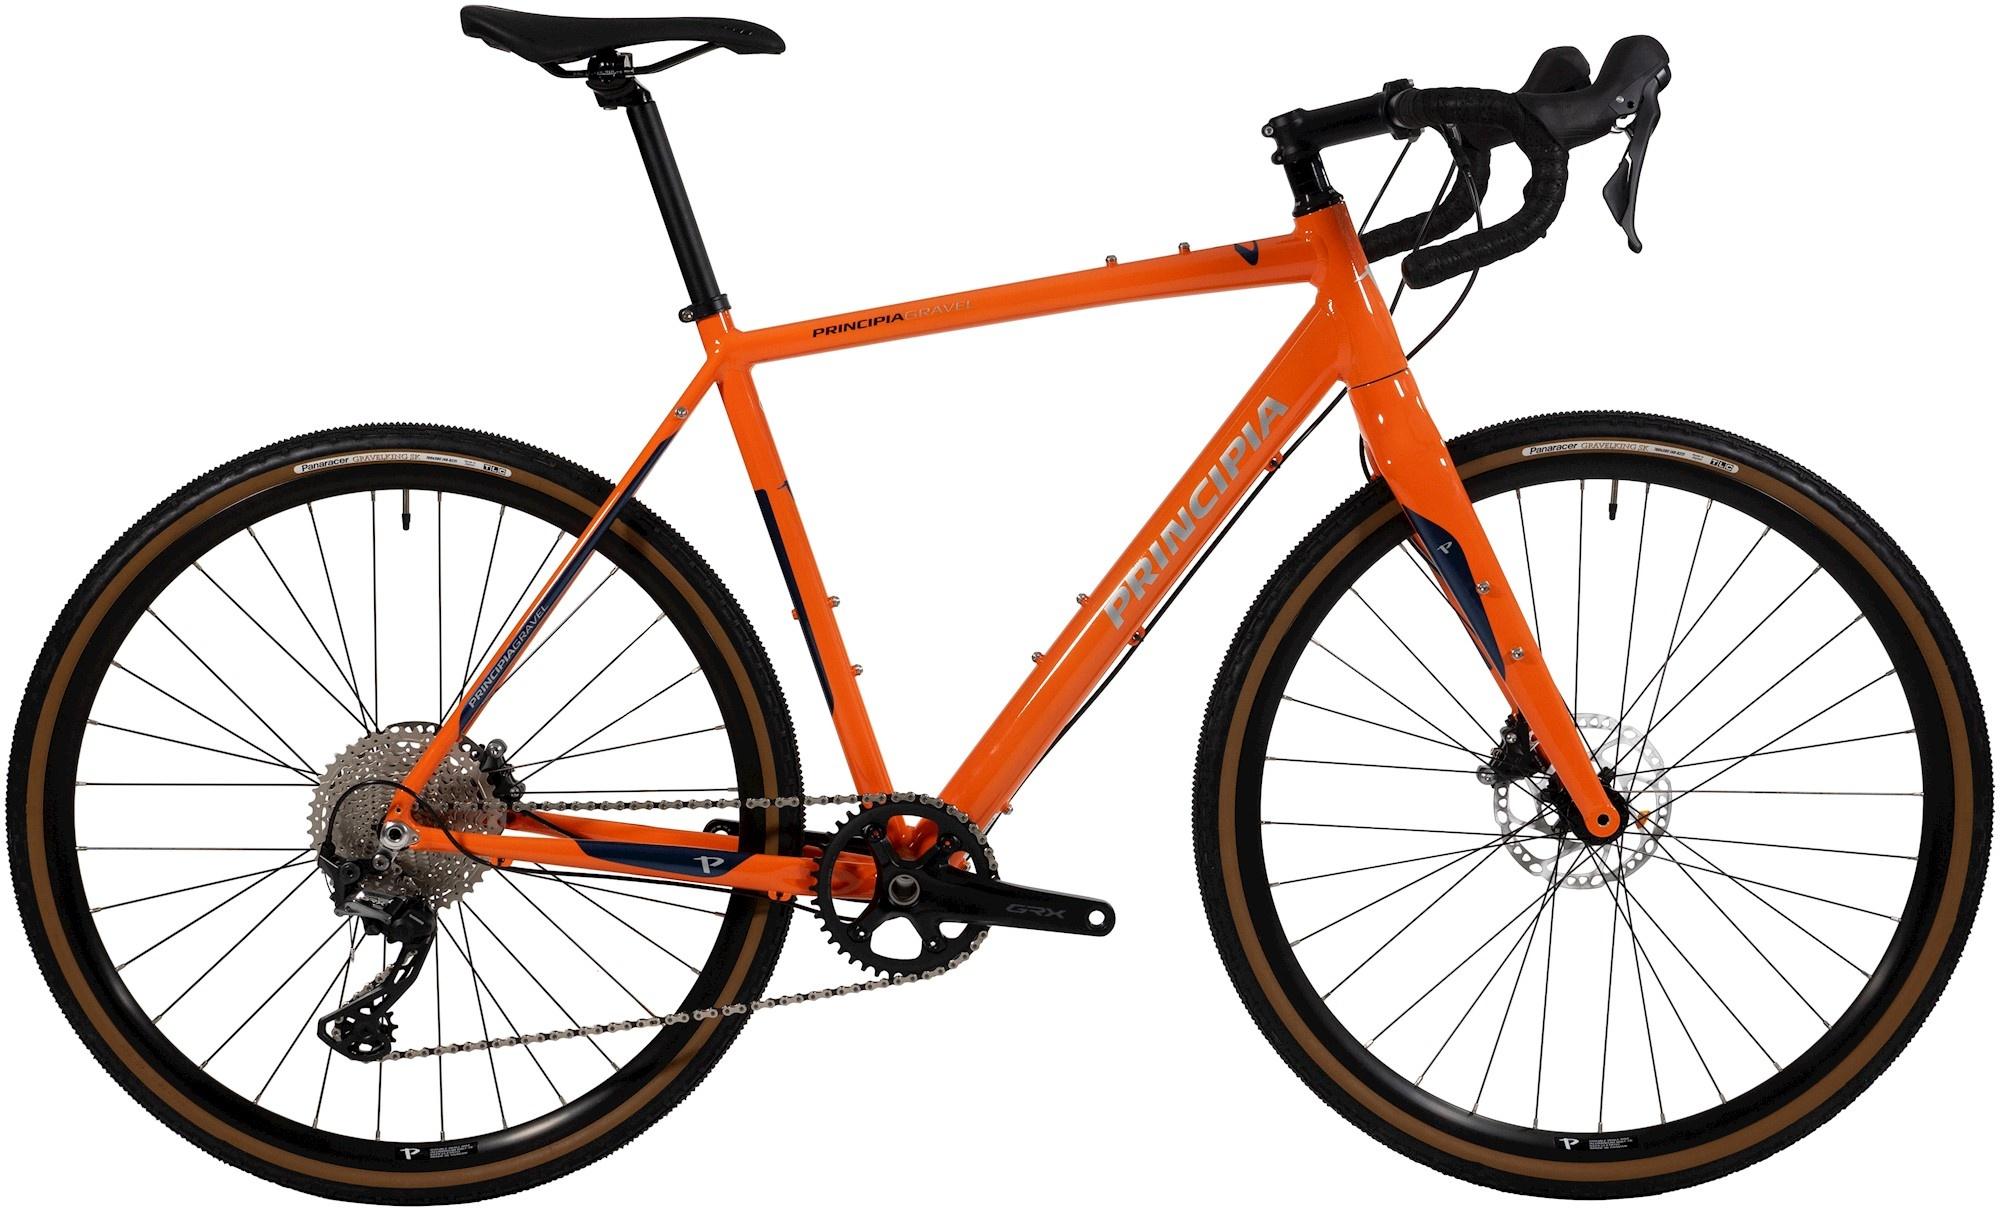 Principia Gravel Alu GRX RX600 2021 - Orange